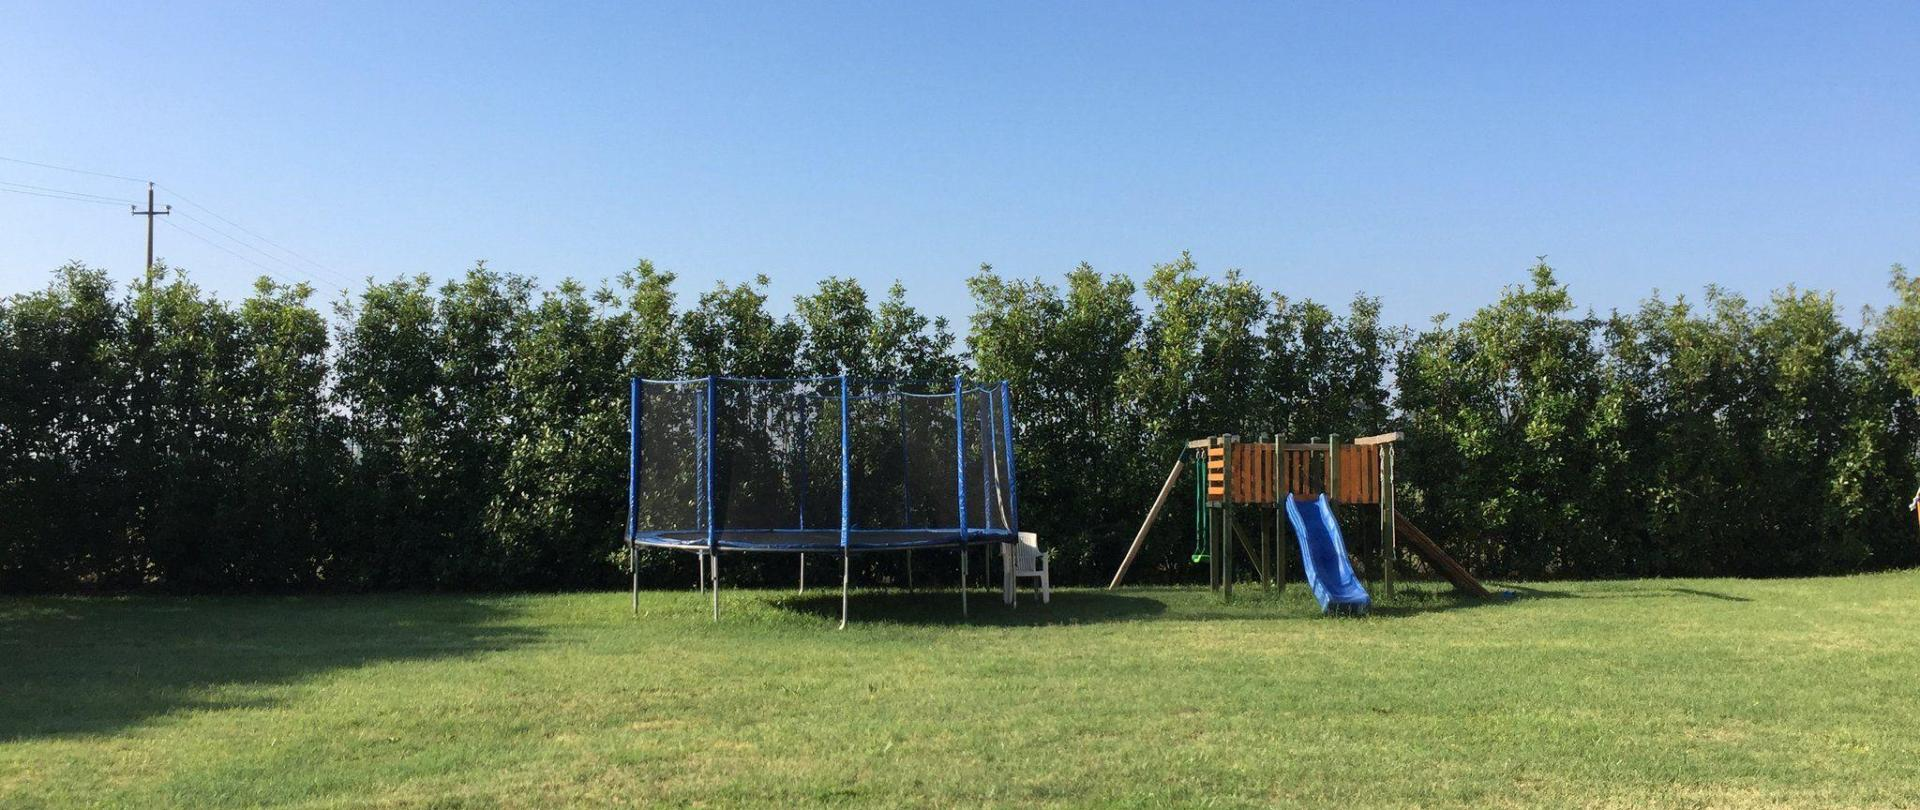 parco-giochi-giardino.jpg